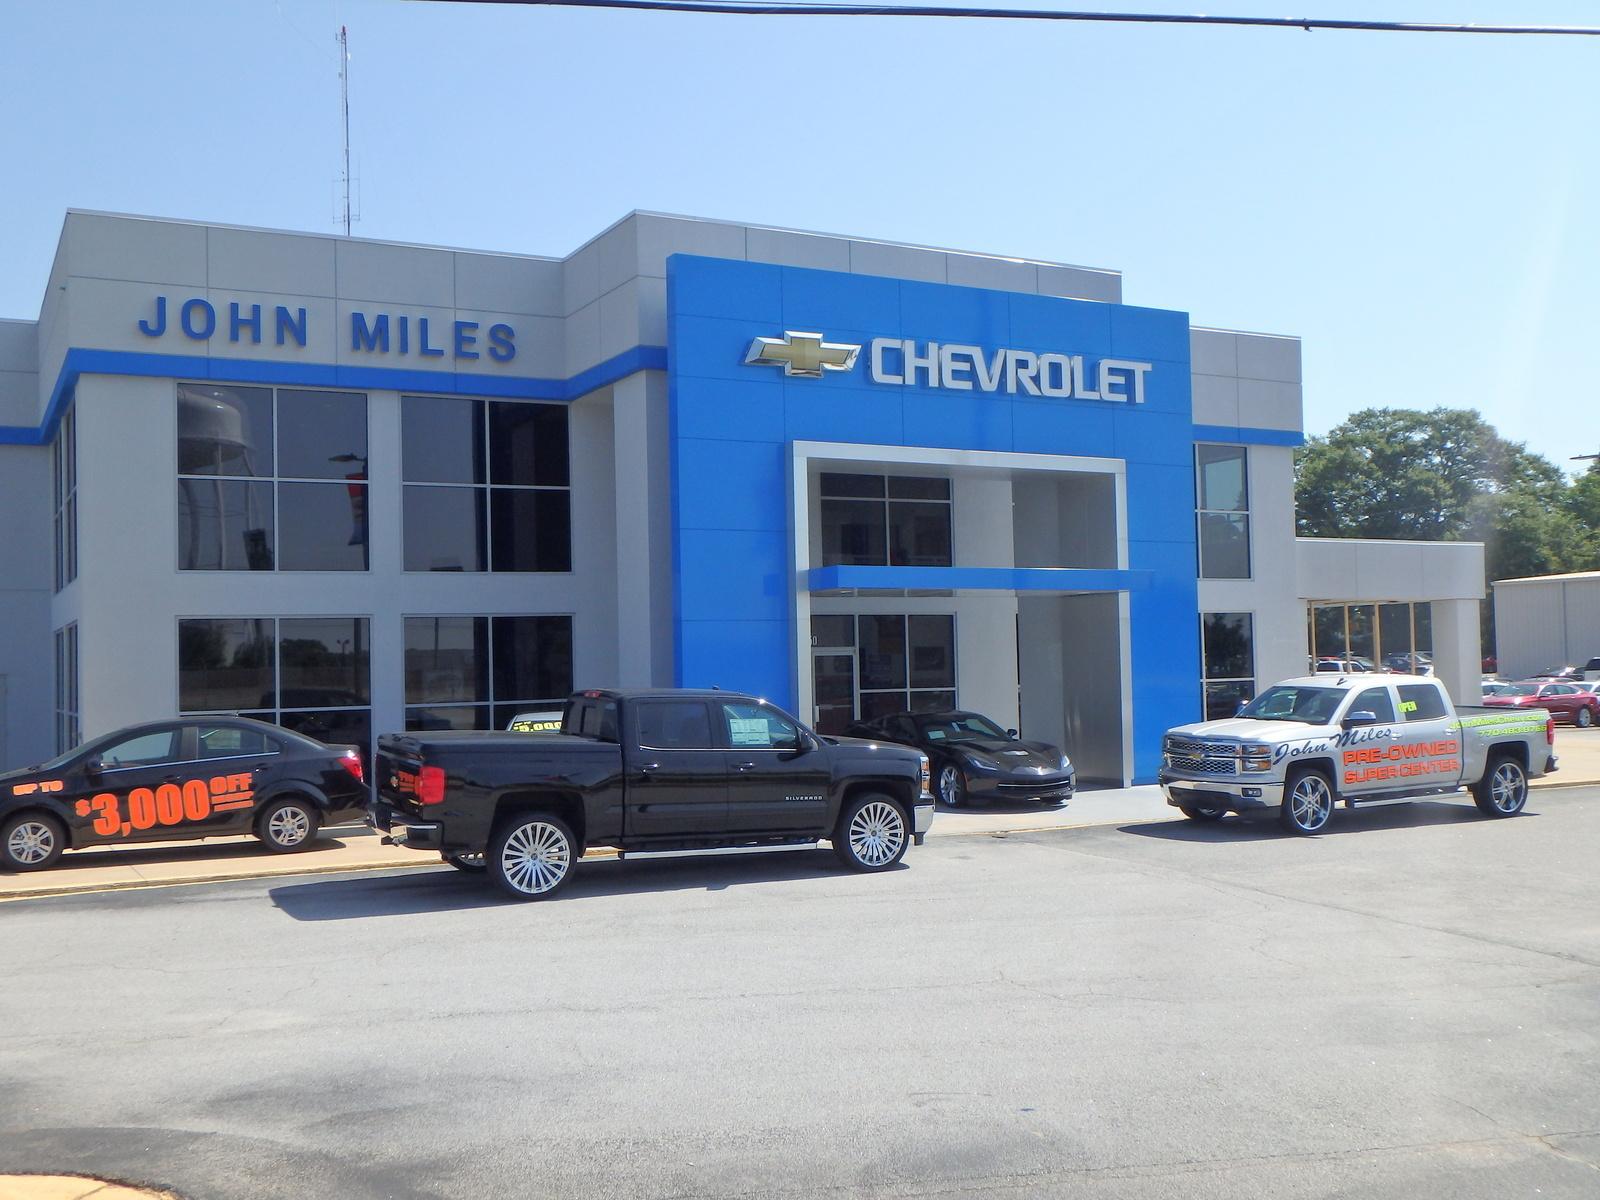 John Miles Chevrolet Buick Gmc Conyers Ga Reviews